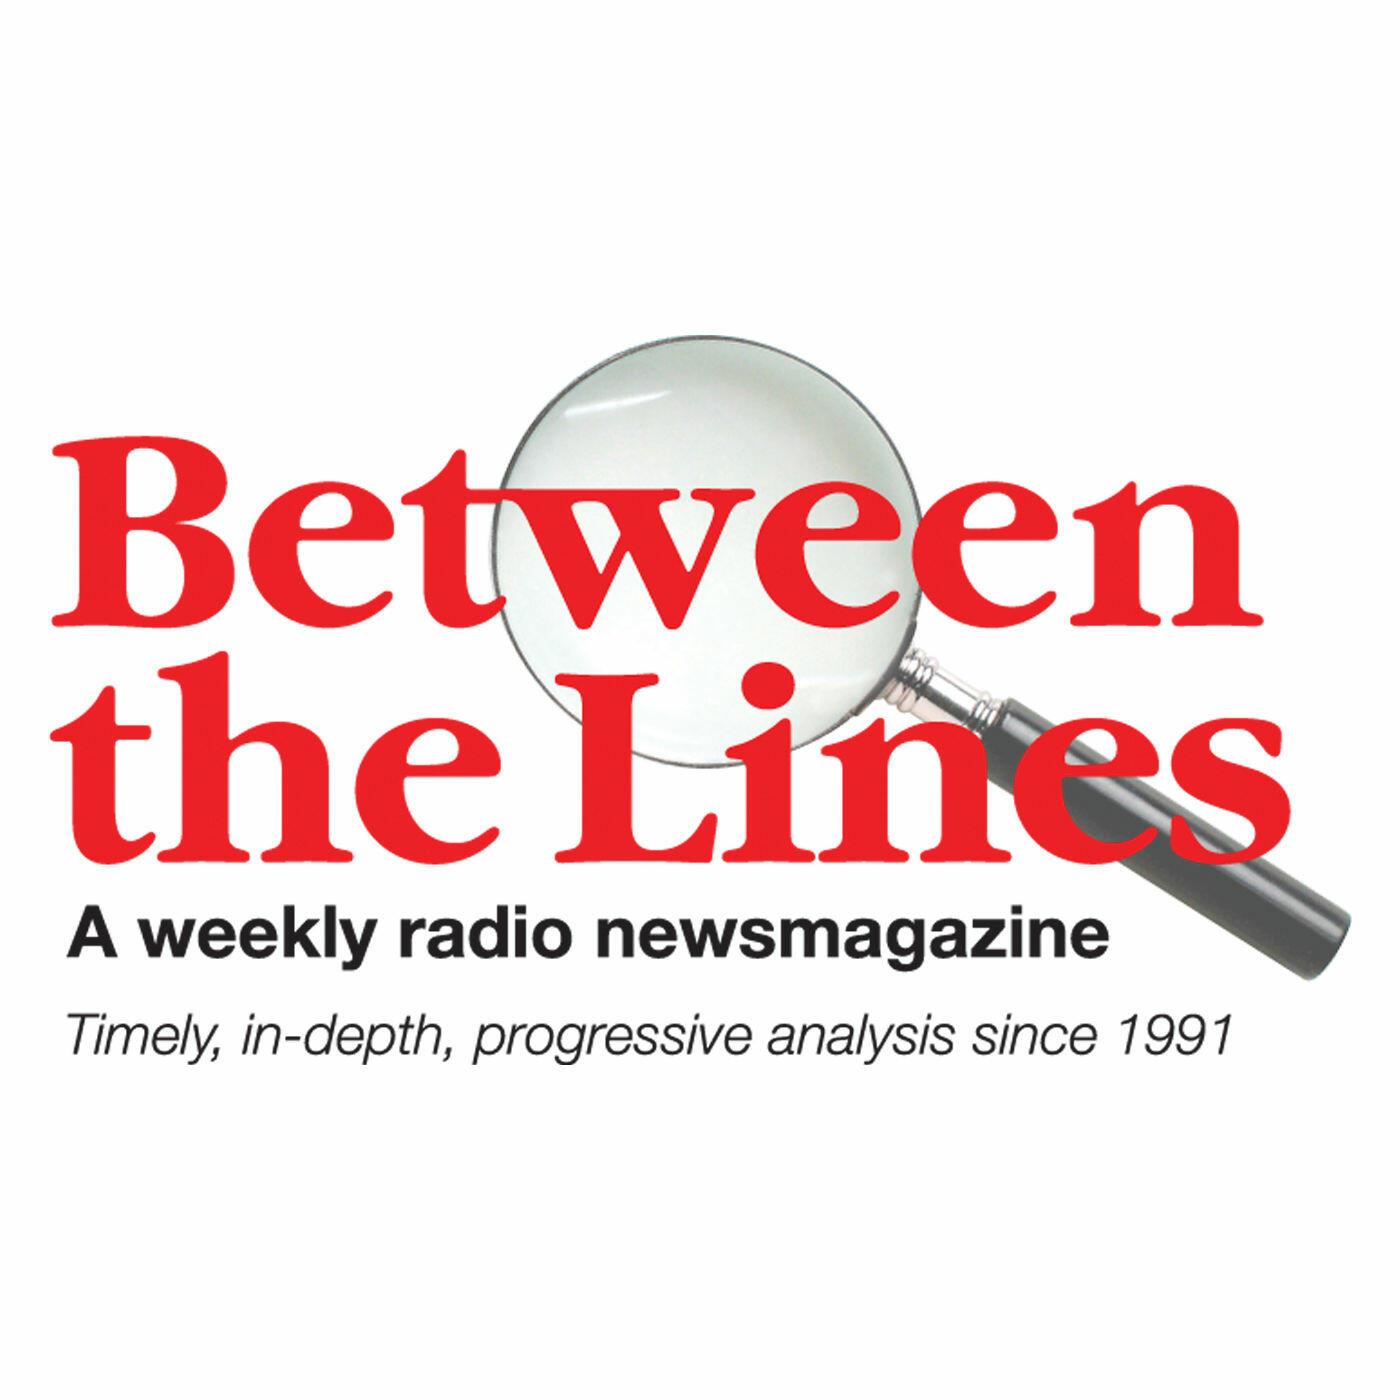 Between The Lines Radio Newsmagazine podcast